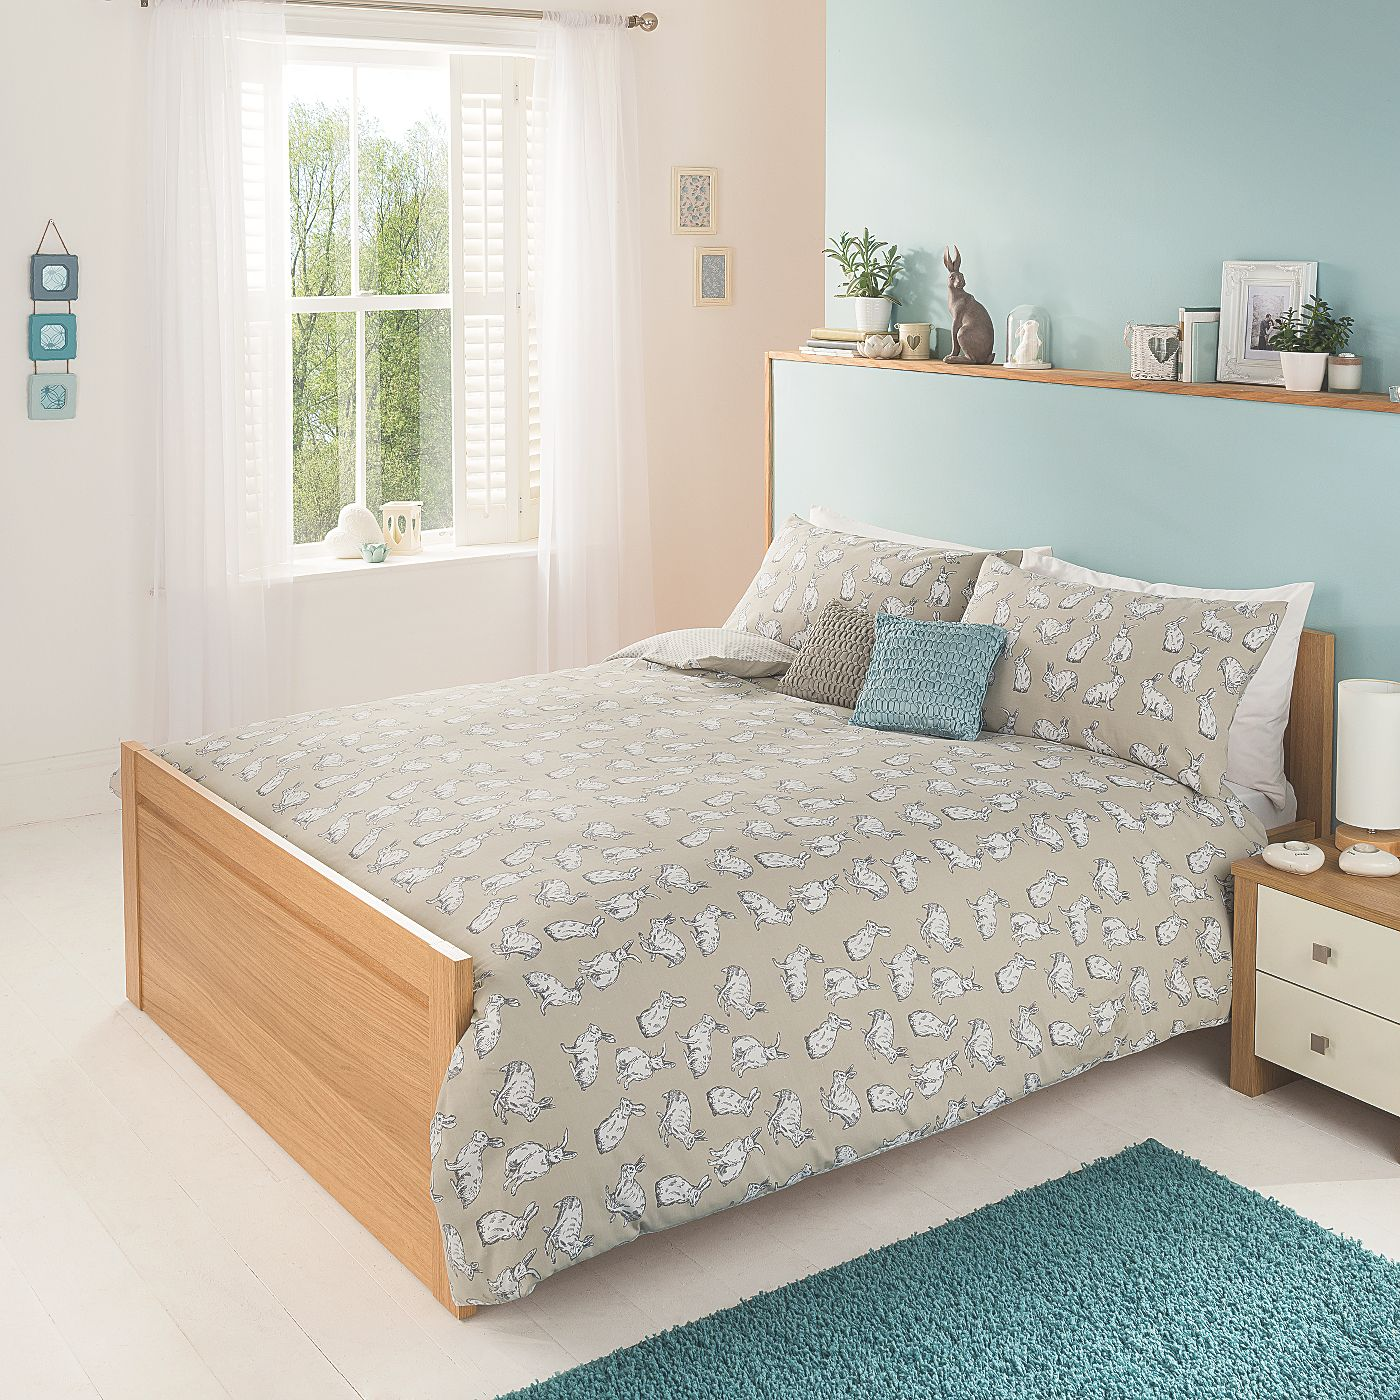 George Home Mini Hares Duvet Range Covers Asda Direct